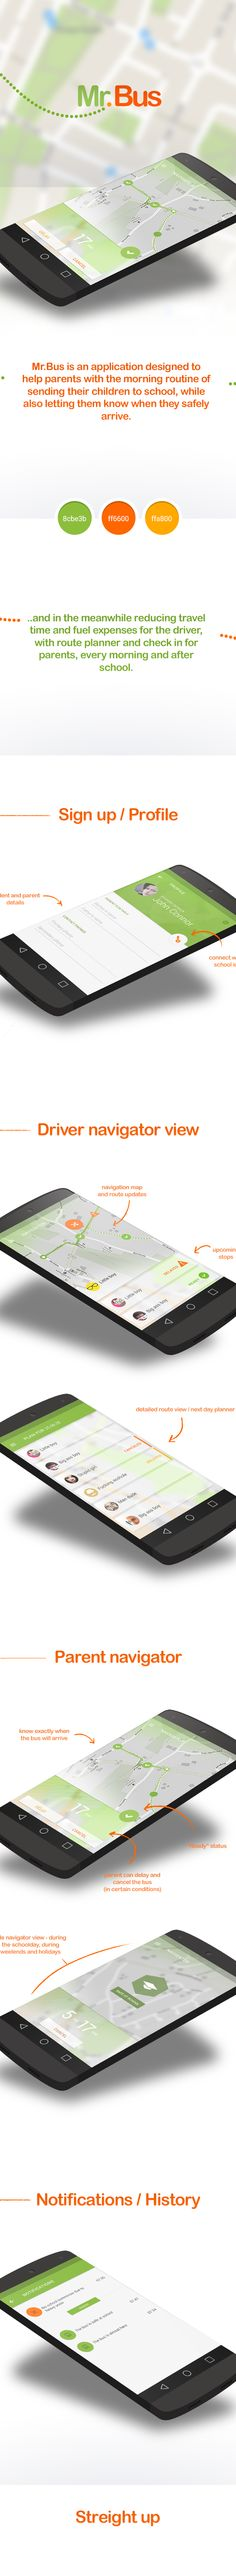 Bus on App Design Served Mobile App Ui, Mobile App Design, Ui Ux Design, Graphic Design, Ios Ui, Ui Inspiration, Dashboards, Interactive Design, User Interface